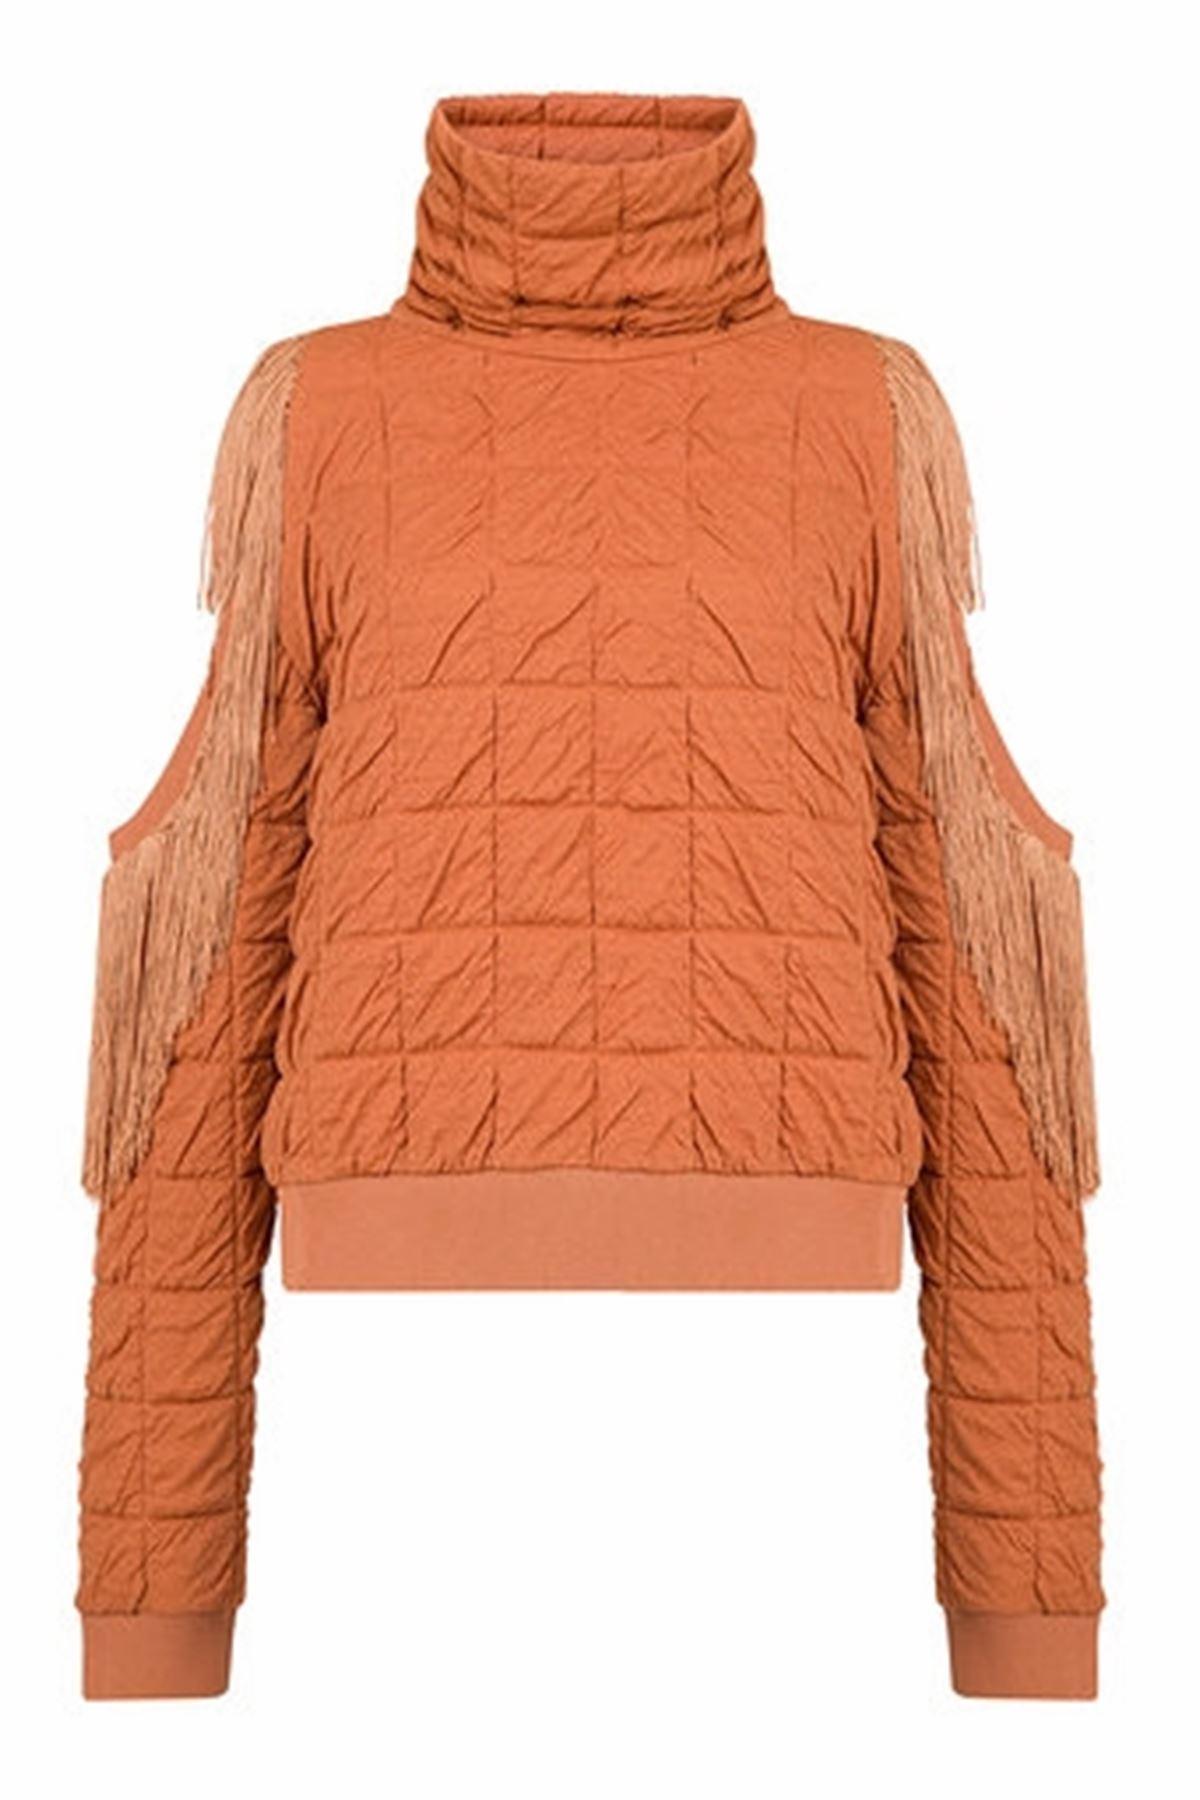 Fringe Detailed Turtlenek Sweatshirt